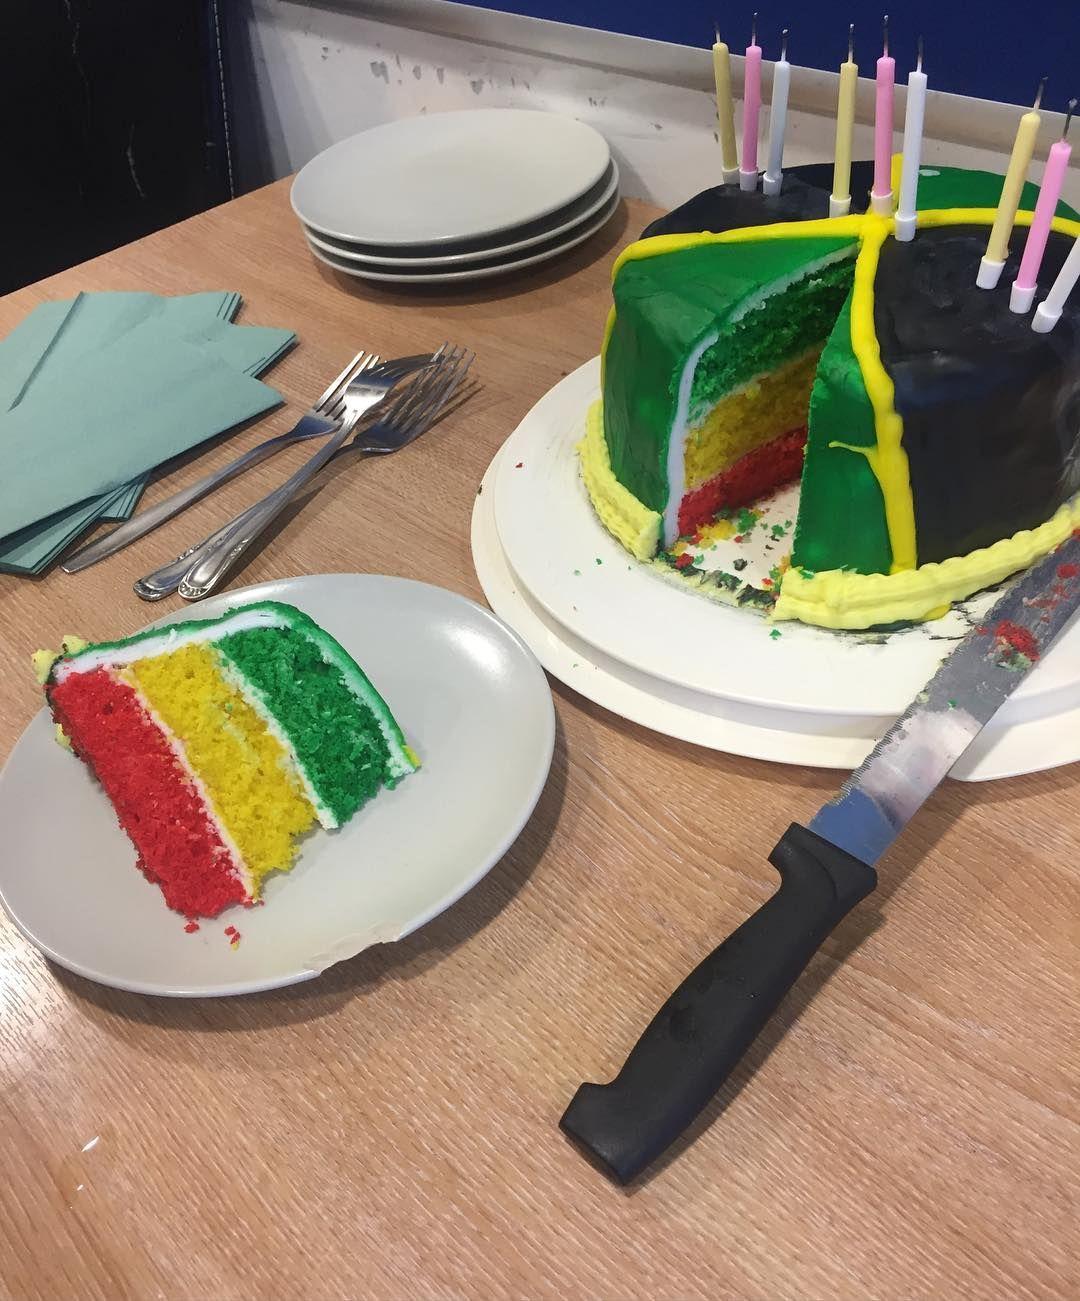 jamaica jamaicacakes jamaicanfood flag happybirthday cake by